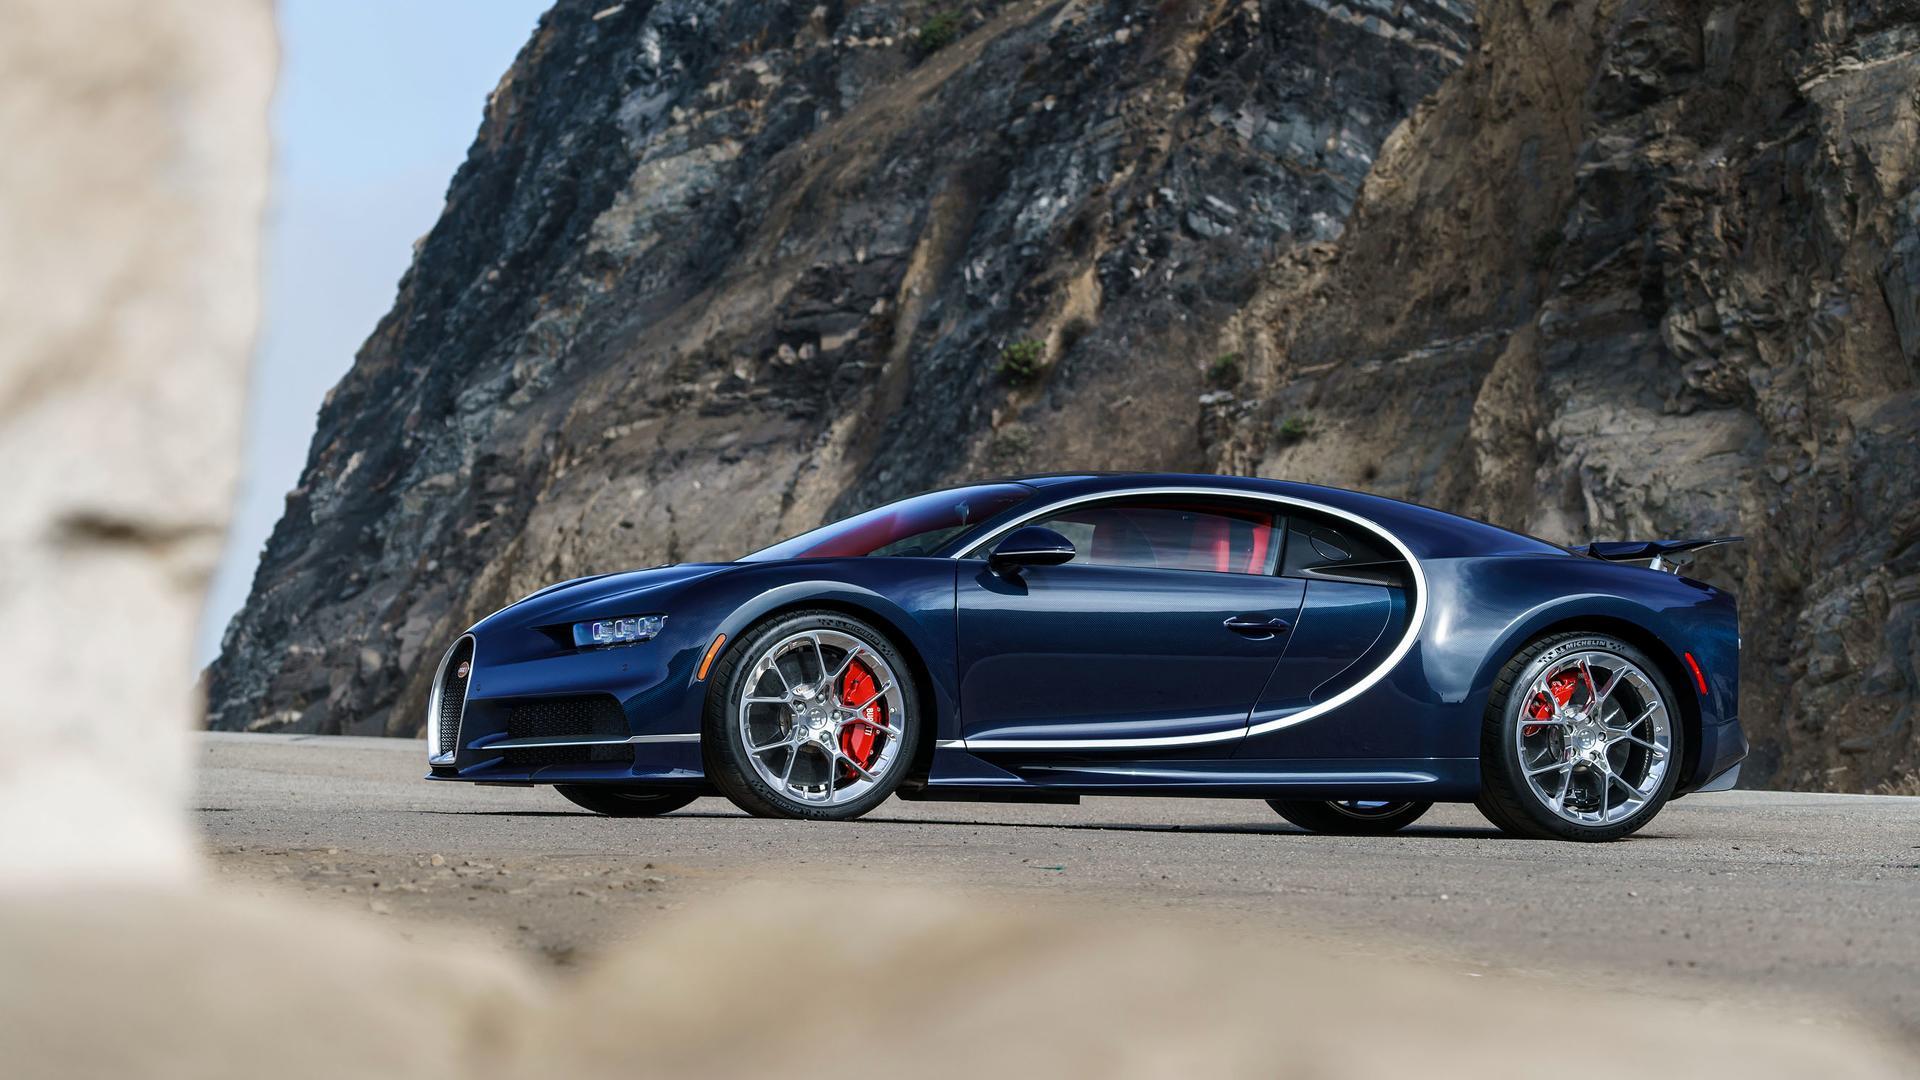 2016 bugatti chiron بوگاتی چیرون نقد و بررسی   اجاره ماشین